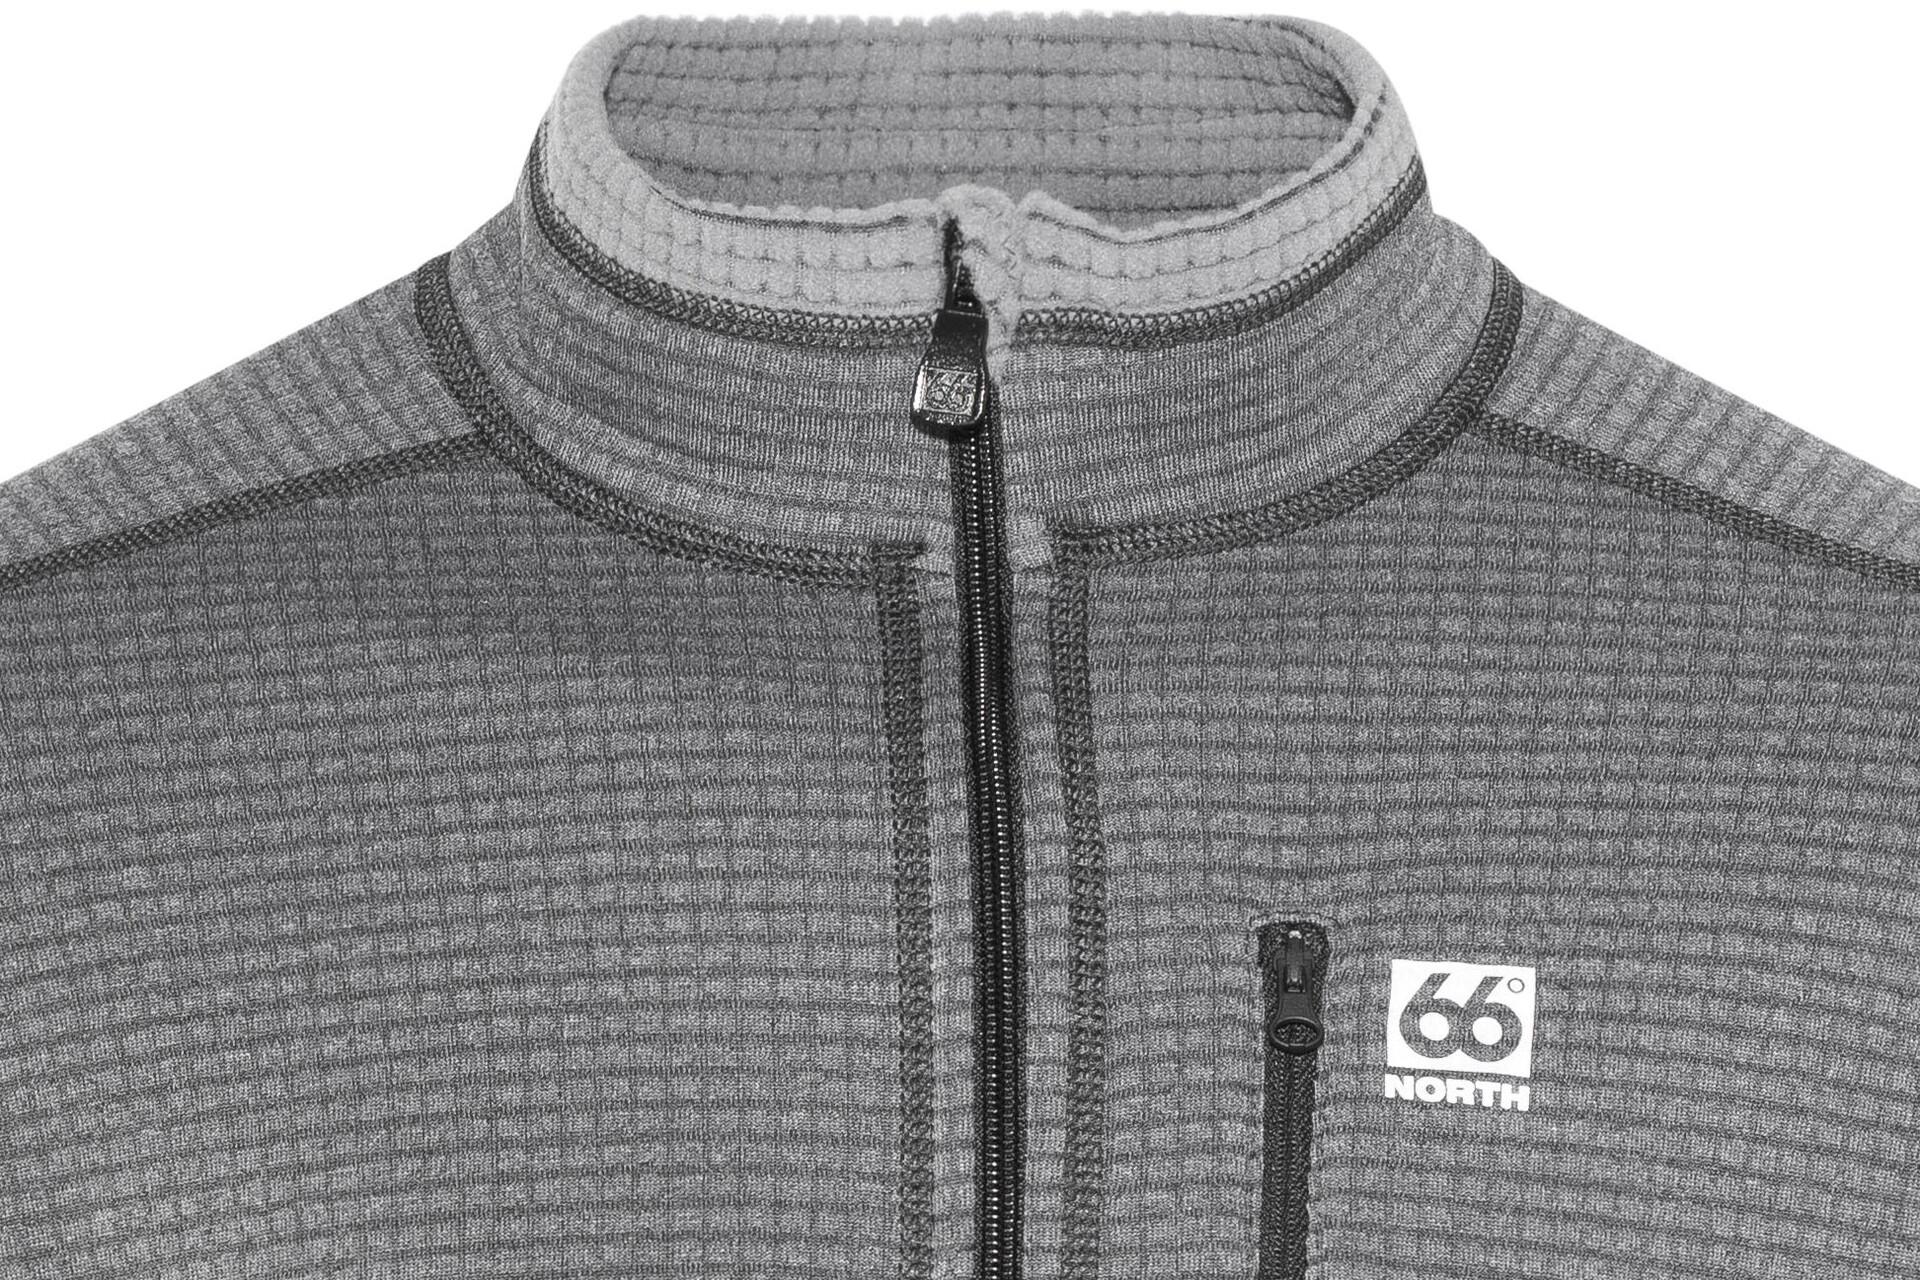 66° North Grettir Zipped Jacket Men lavic greyblack